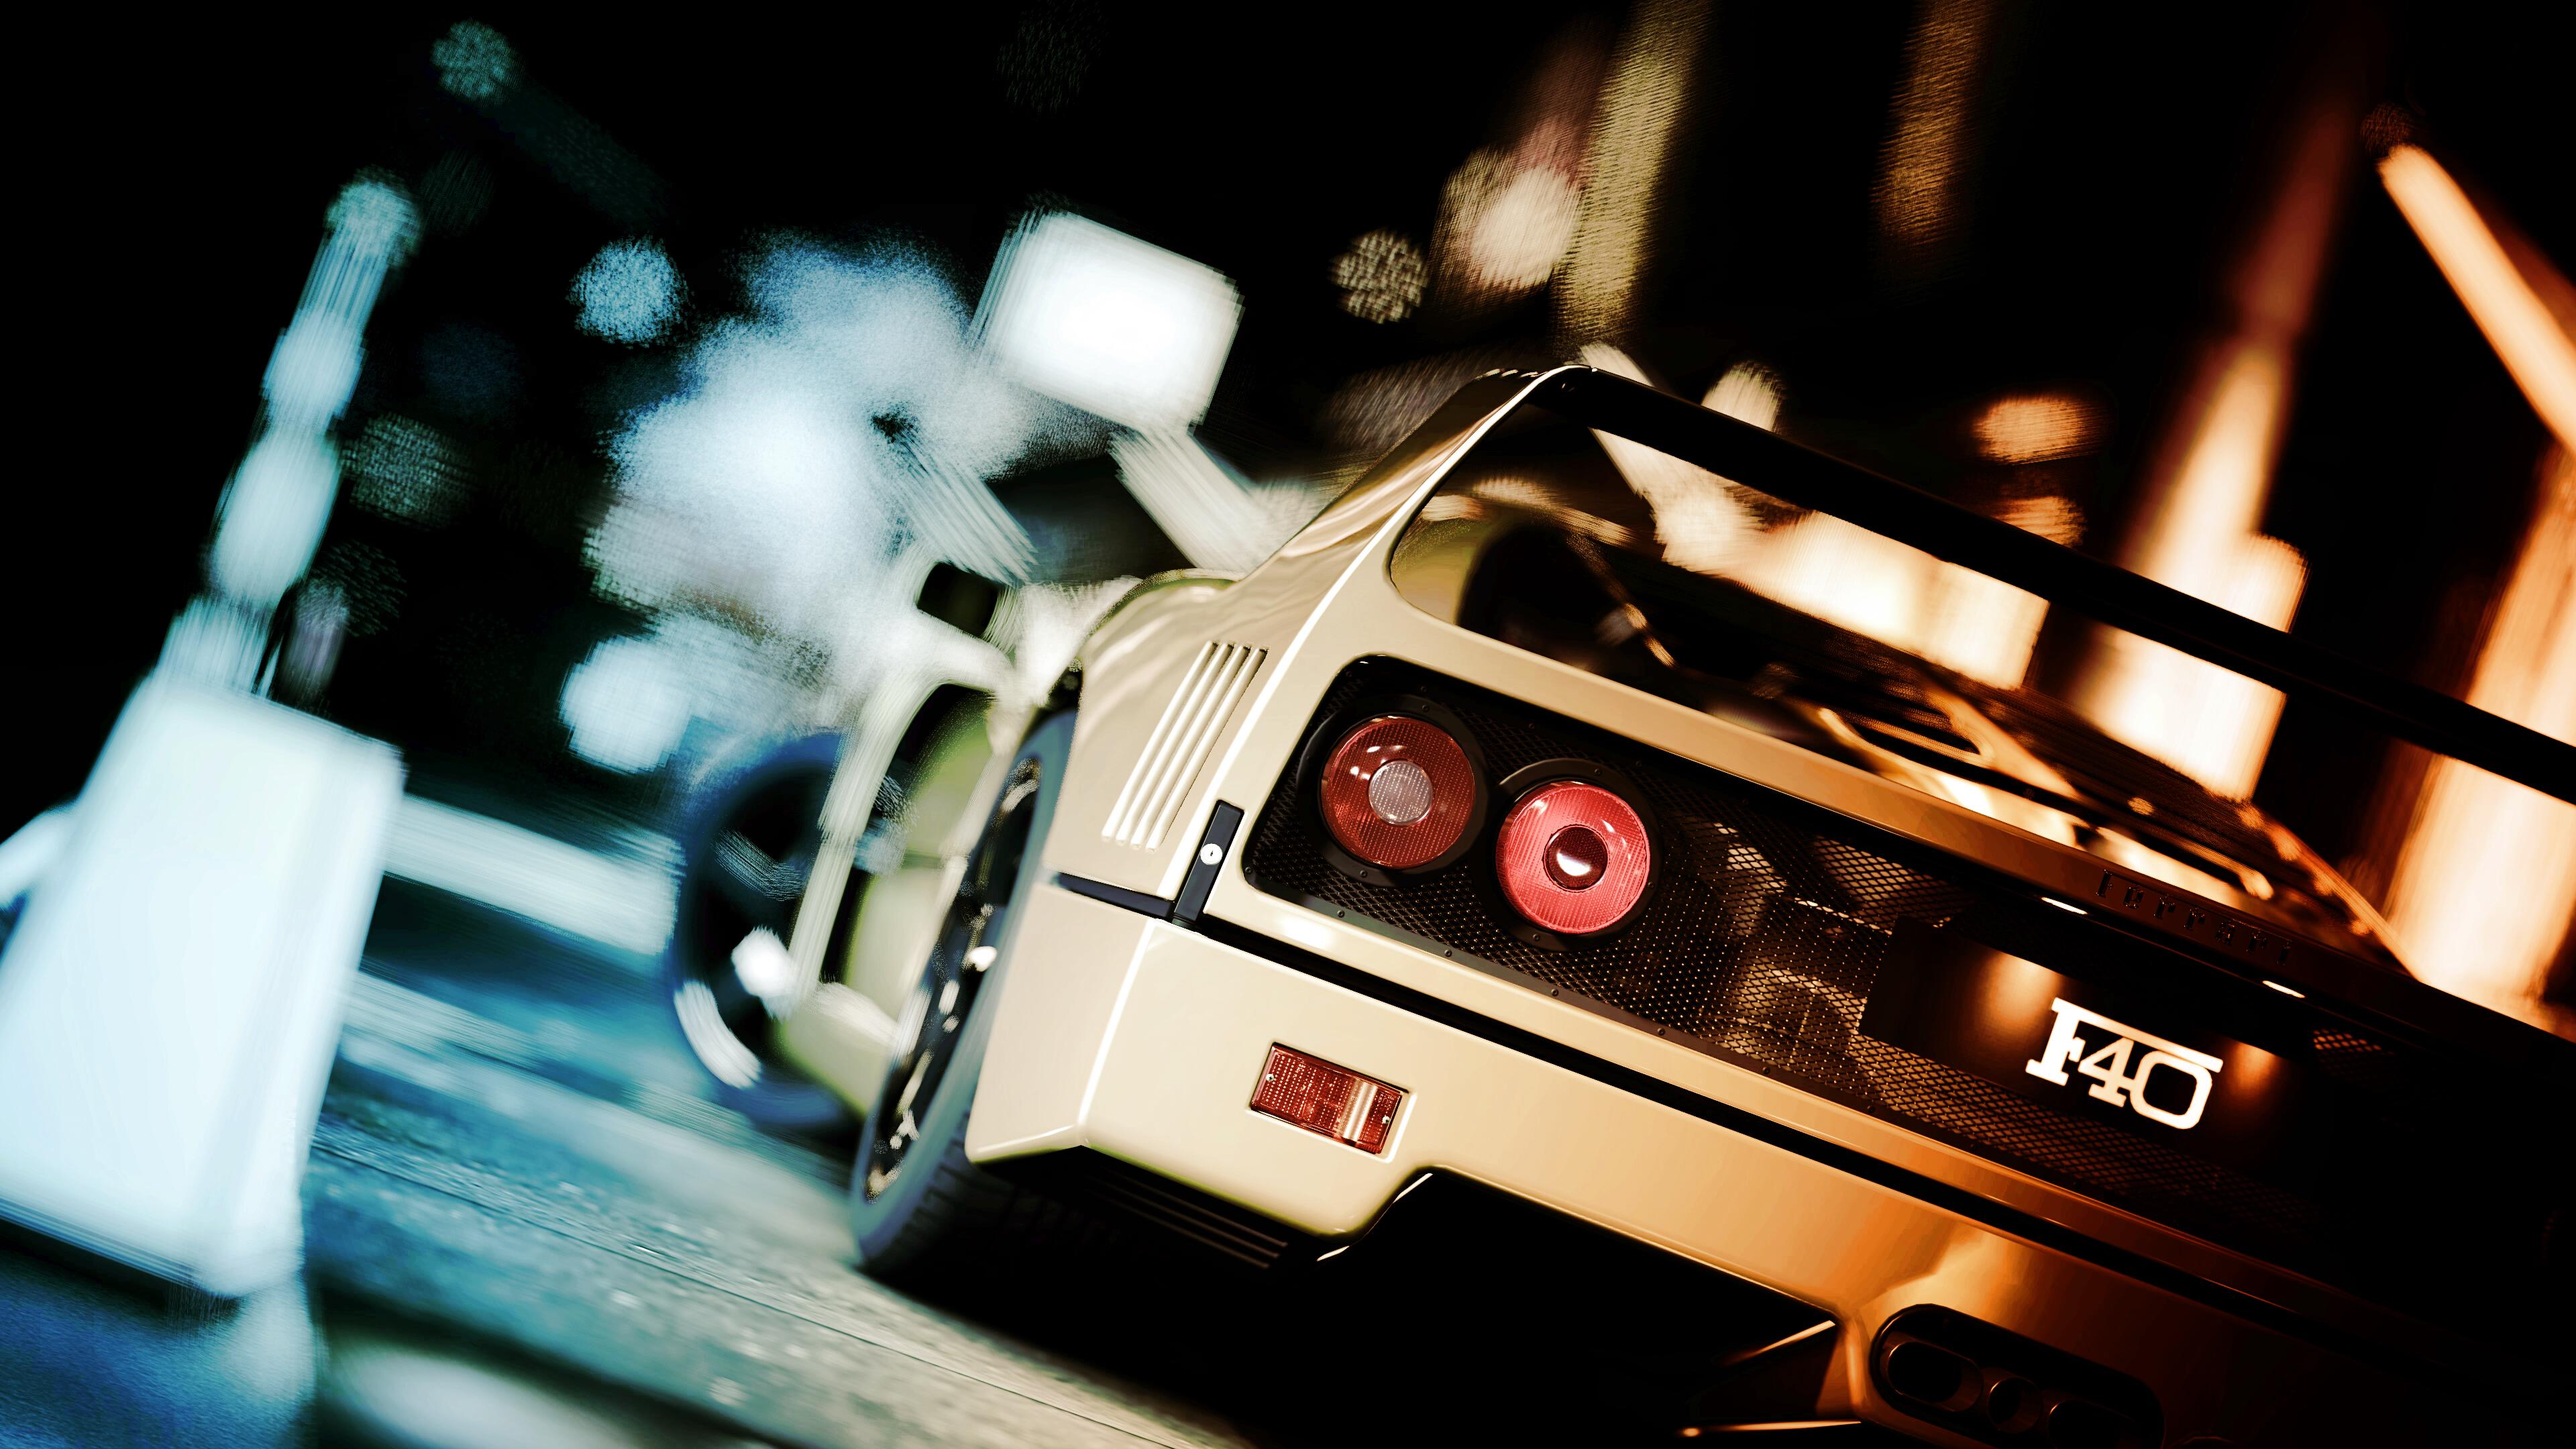 Gran Turismo 4k Ultra Hd Wallpaper Background Image 3840x2160